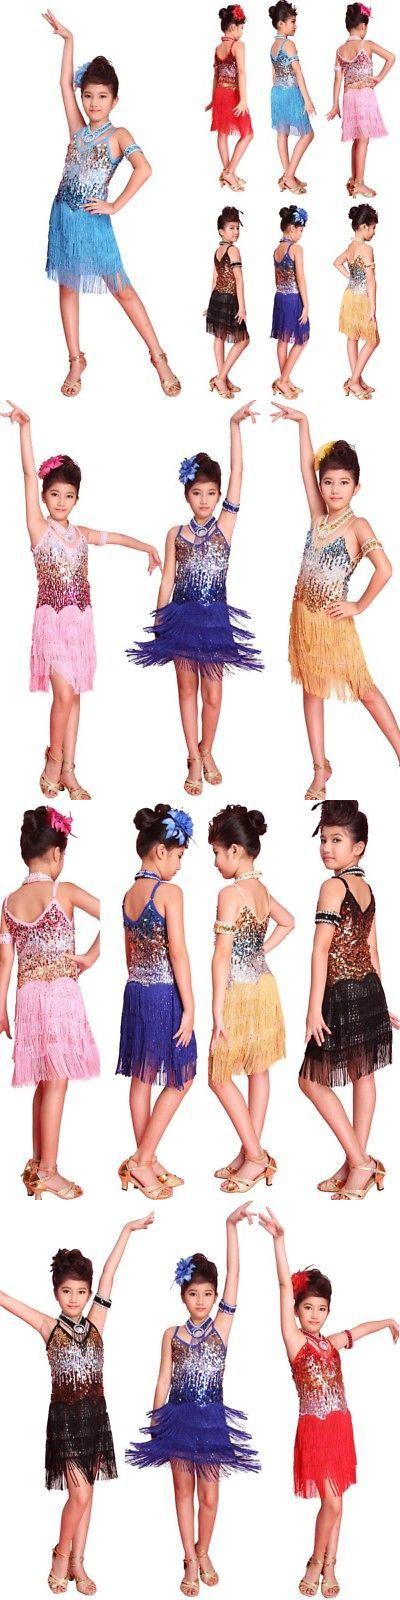 27cd314c6bd0 Dresses and Tutus 152352: Girls Latin Dance Dress Tango Sequin Dance  Children Fairy Dress Costume